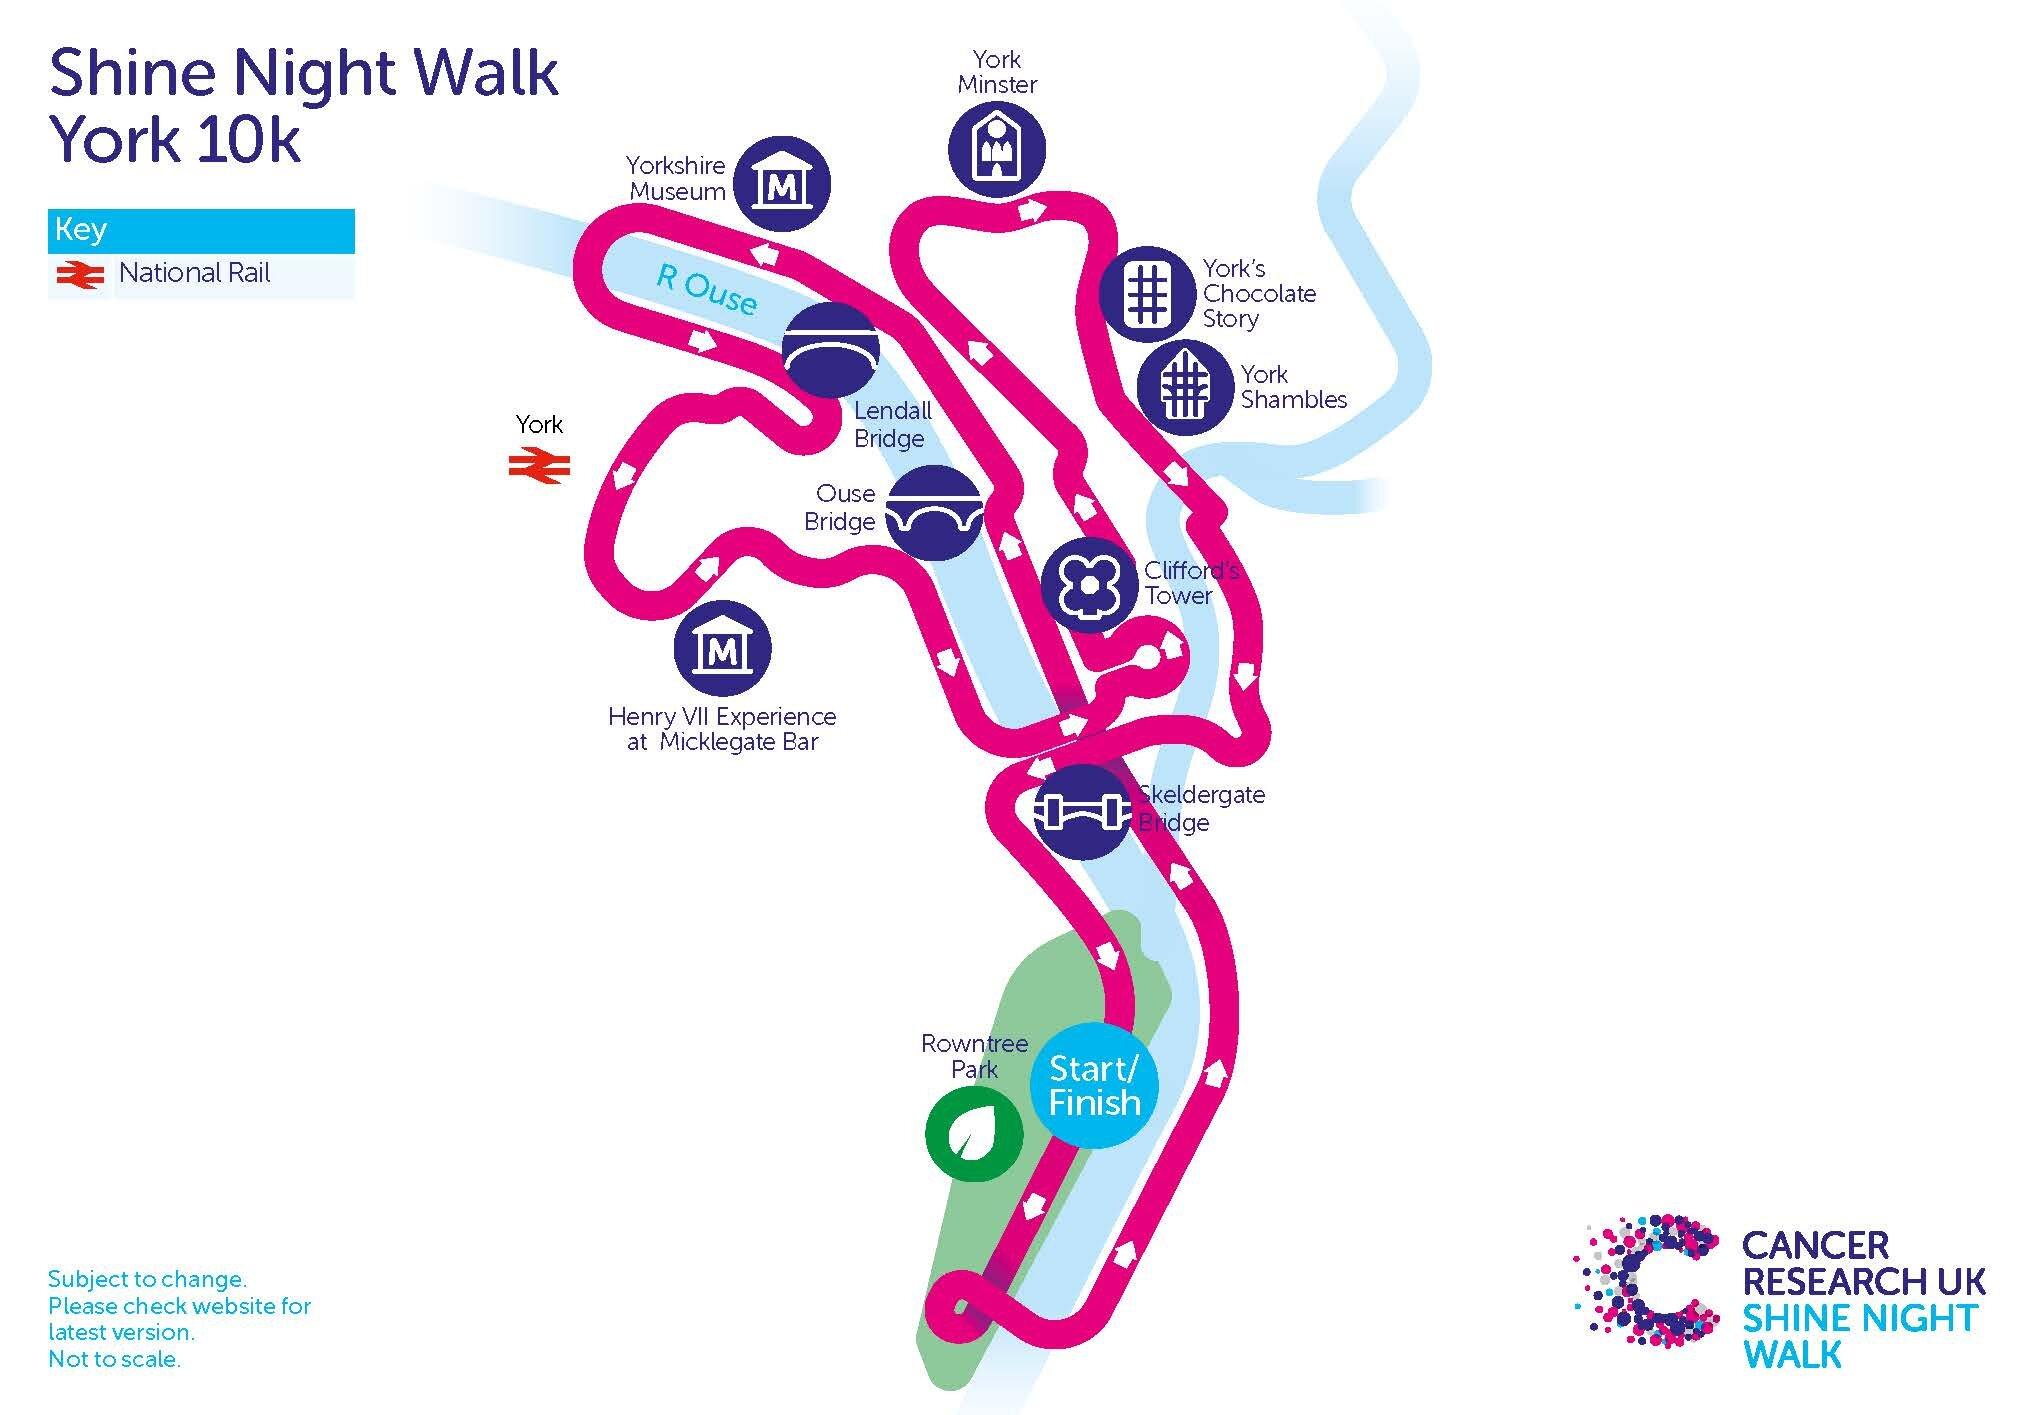 shine_night_walk_2019_york_map.jpg